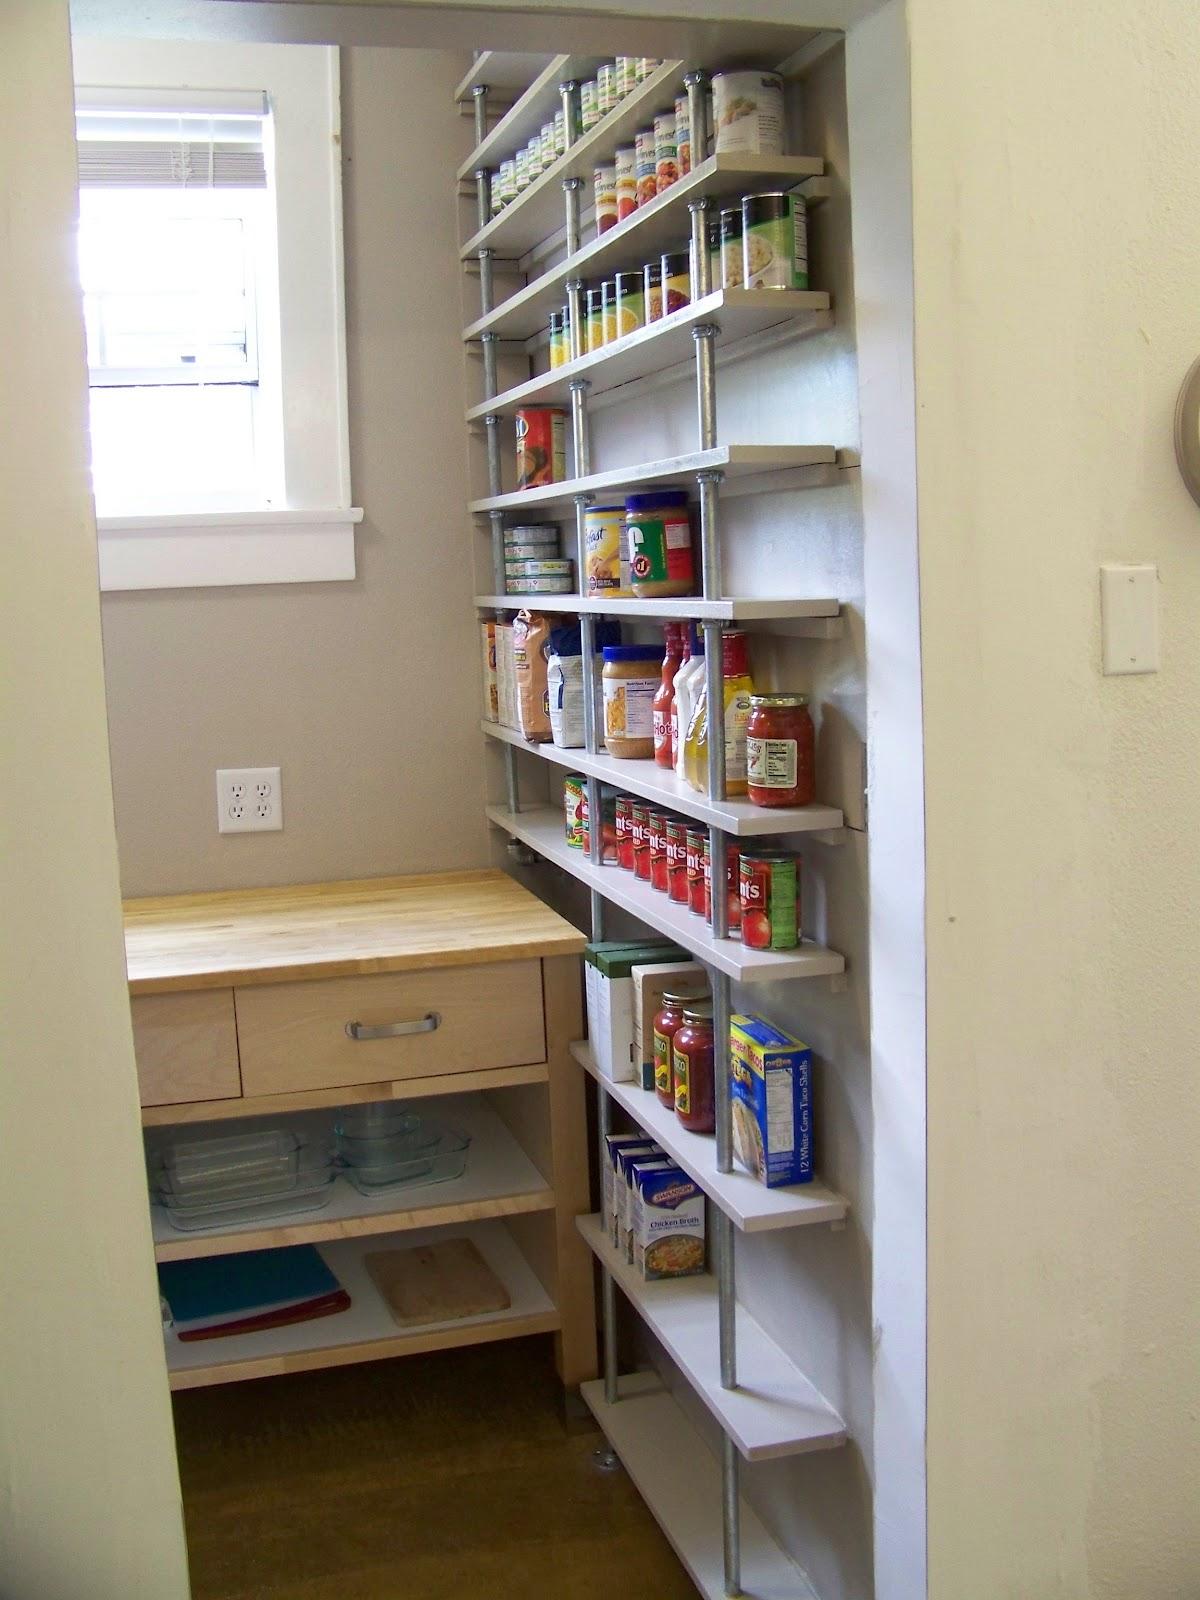 Ck And Nate Header Pantry Shelves Done